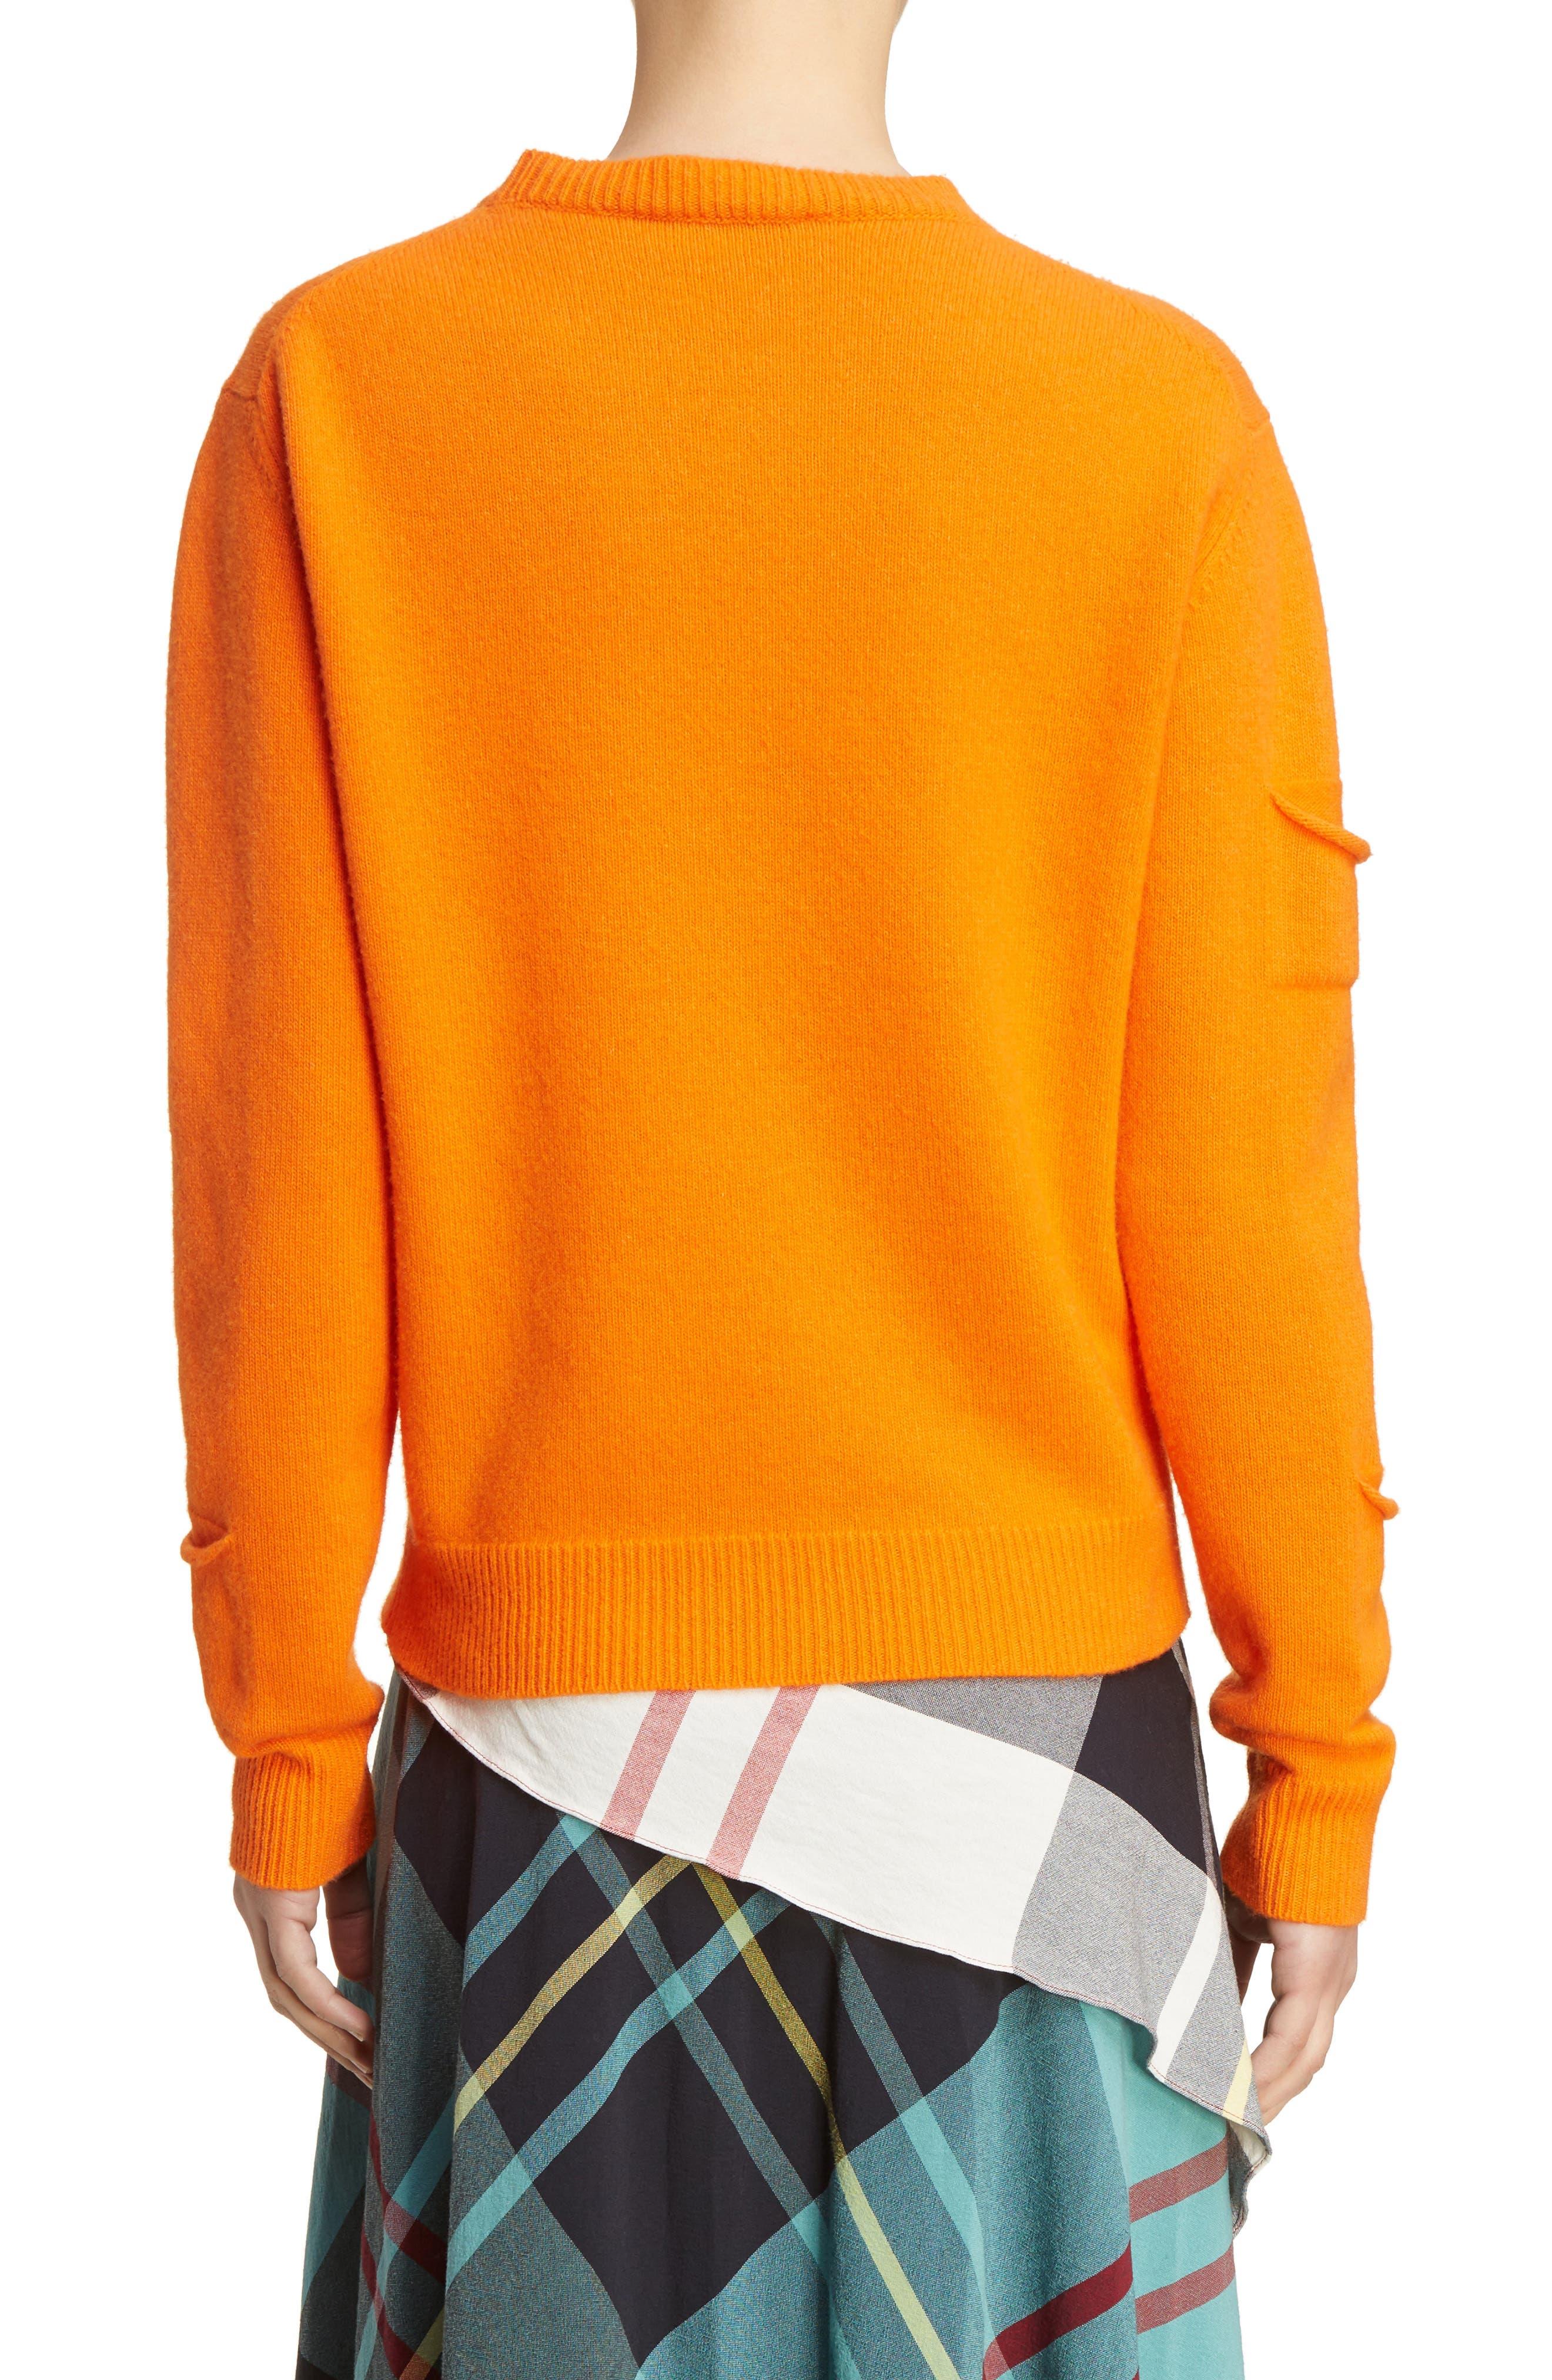 J.W.ANDERSON Multi Pocket Crewneck Sweater,                             Alternate thumbnail 2, color,                             Tangerine